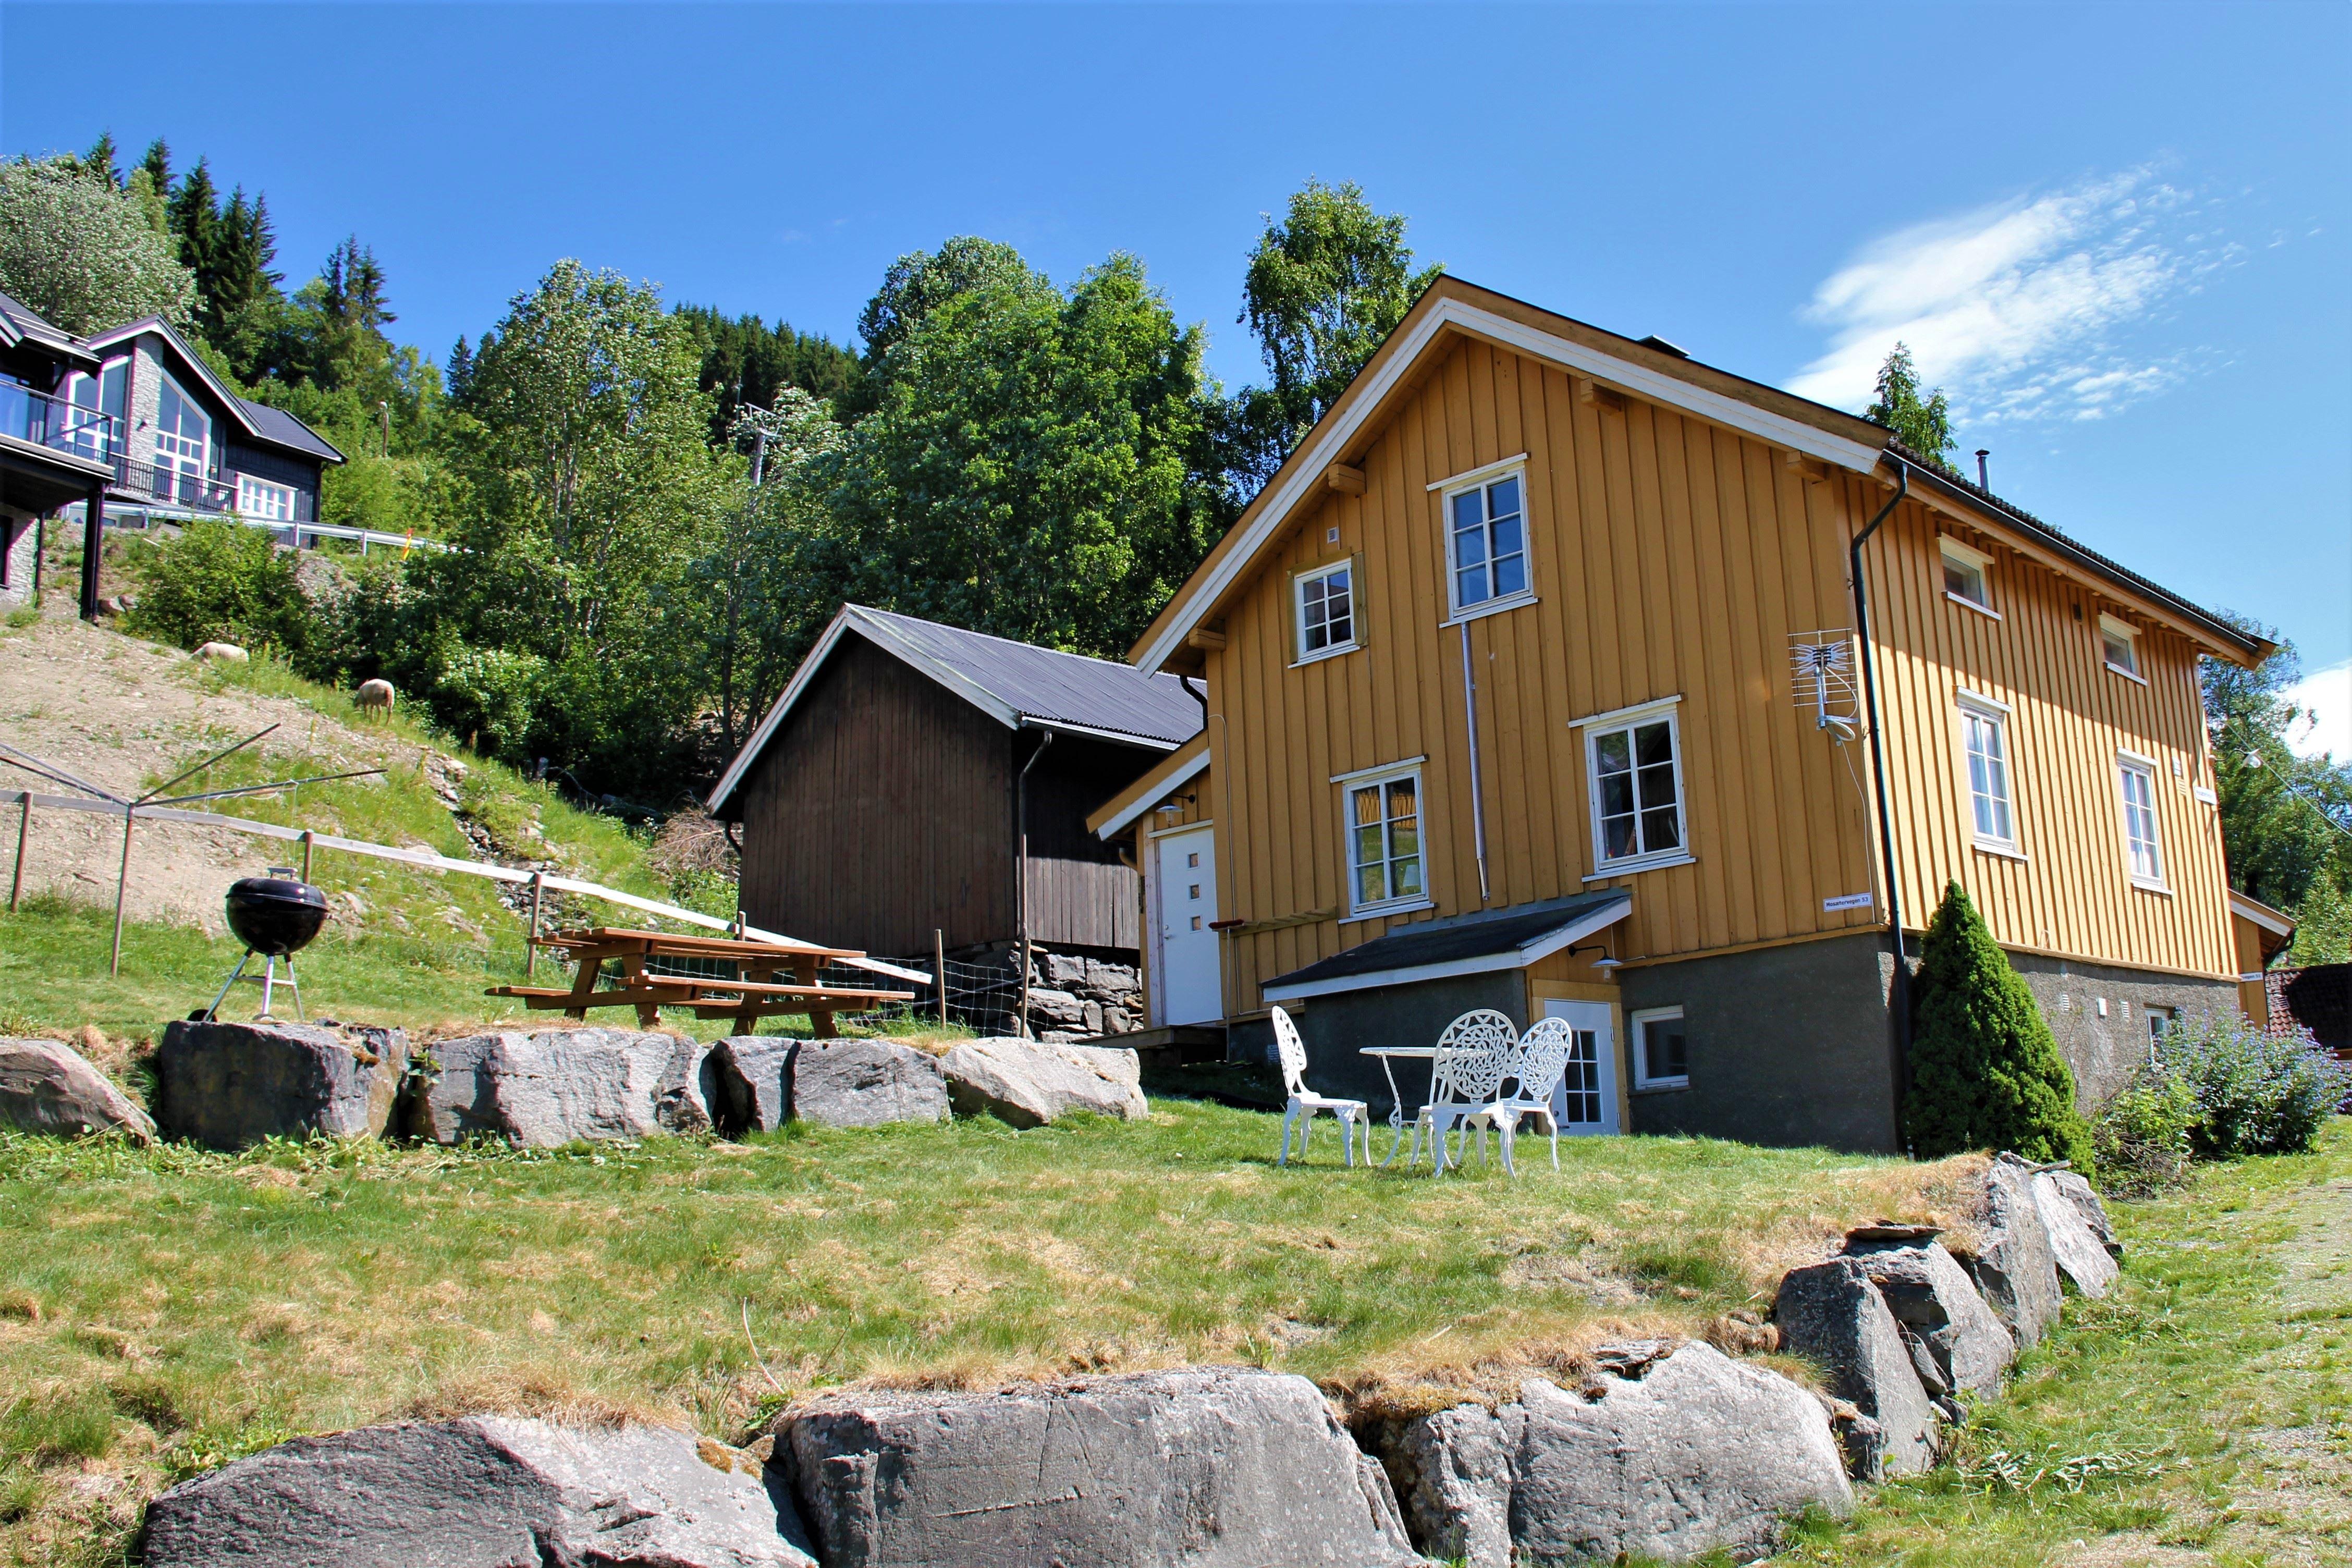 Hafjell Gard tenant's house